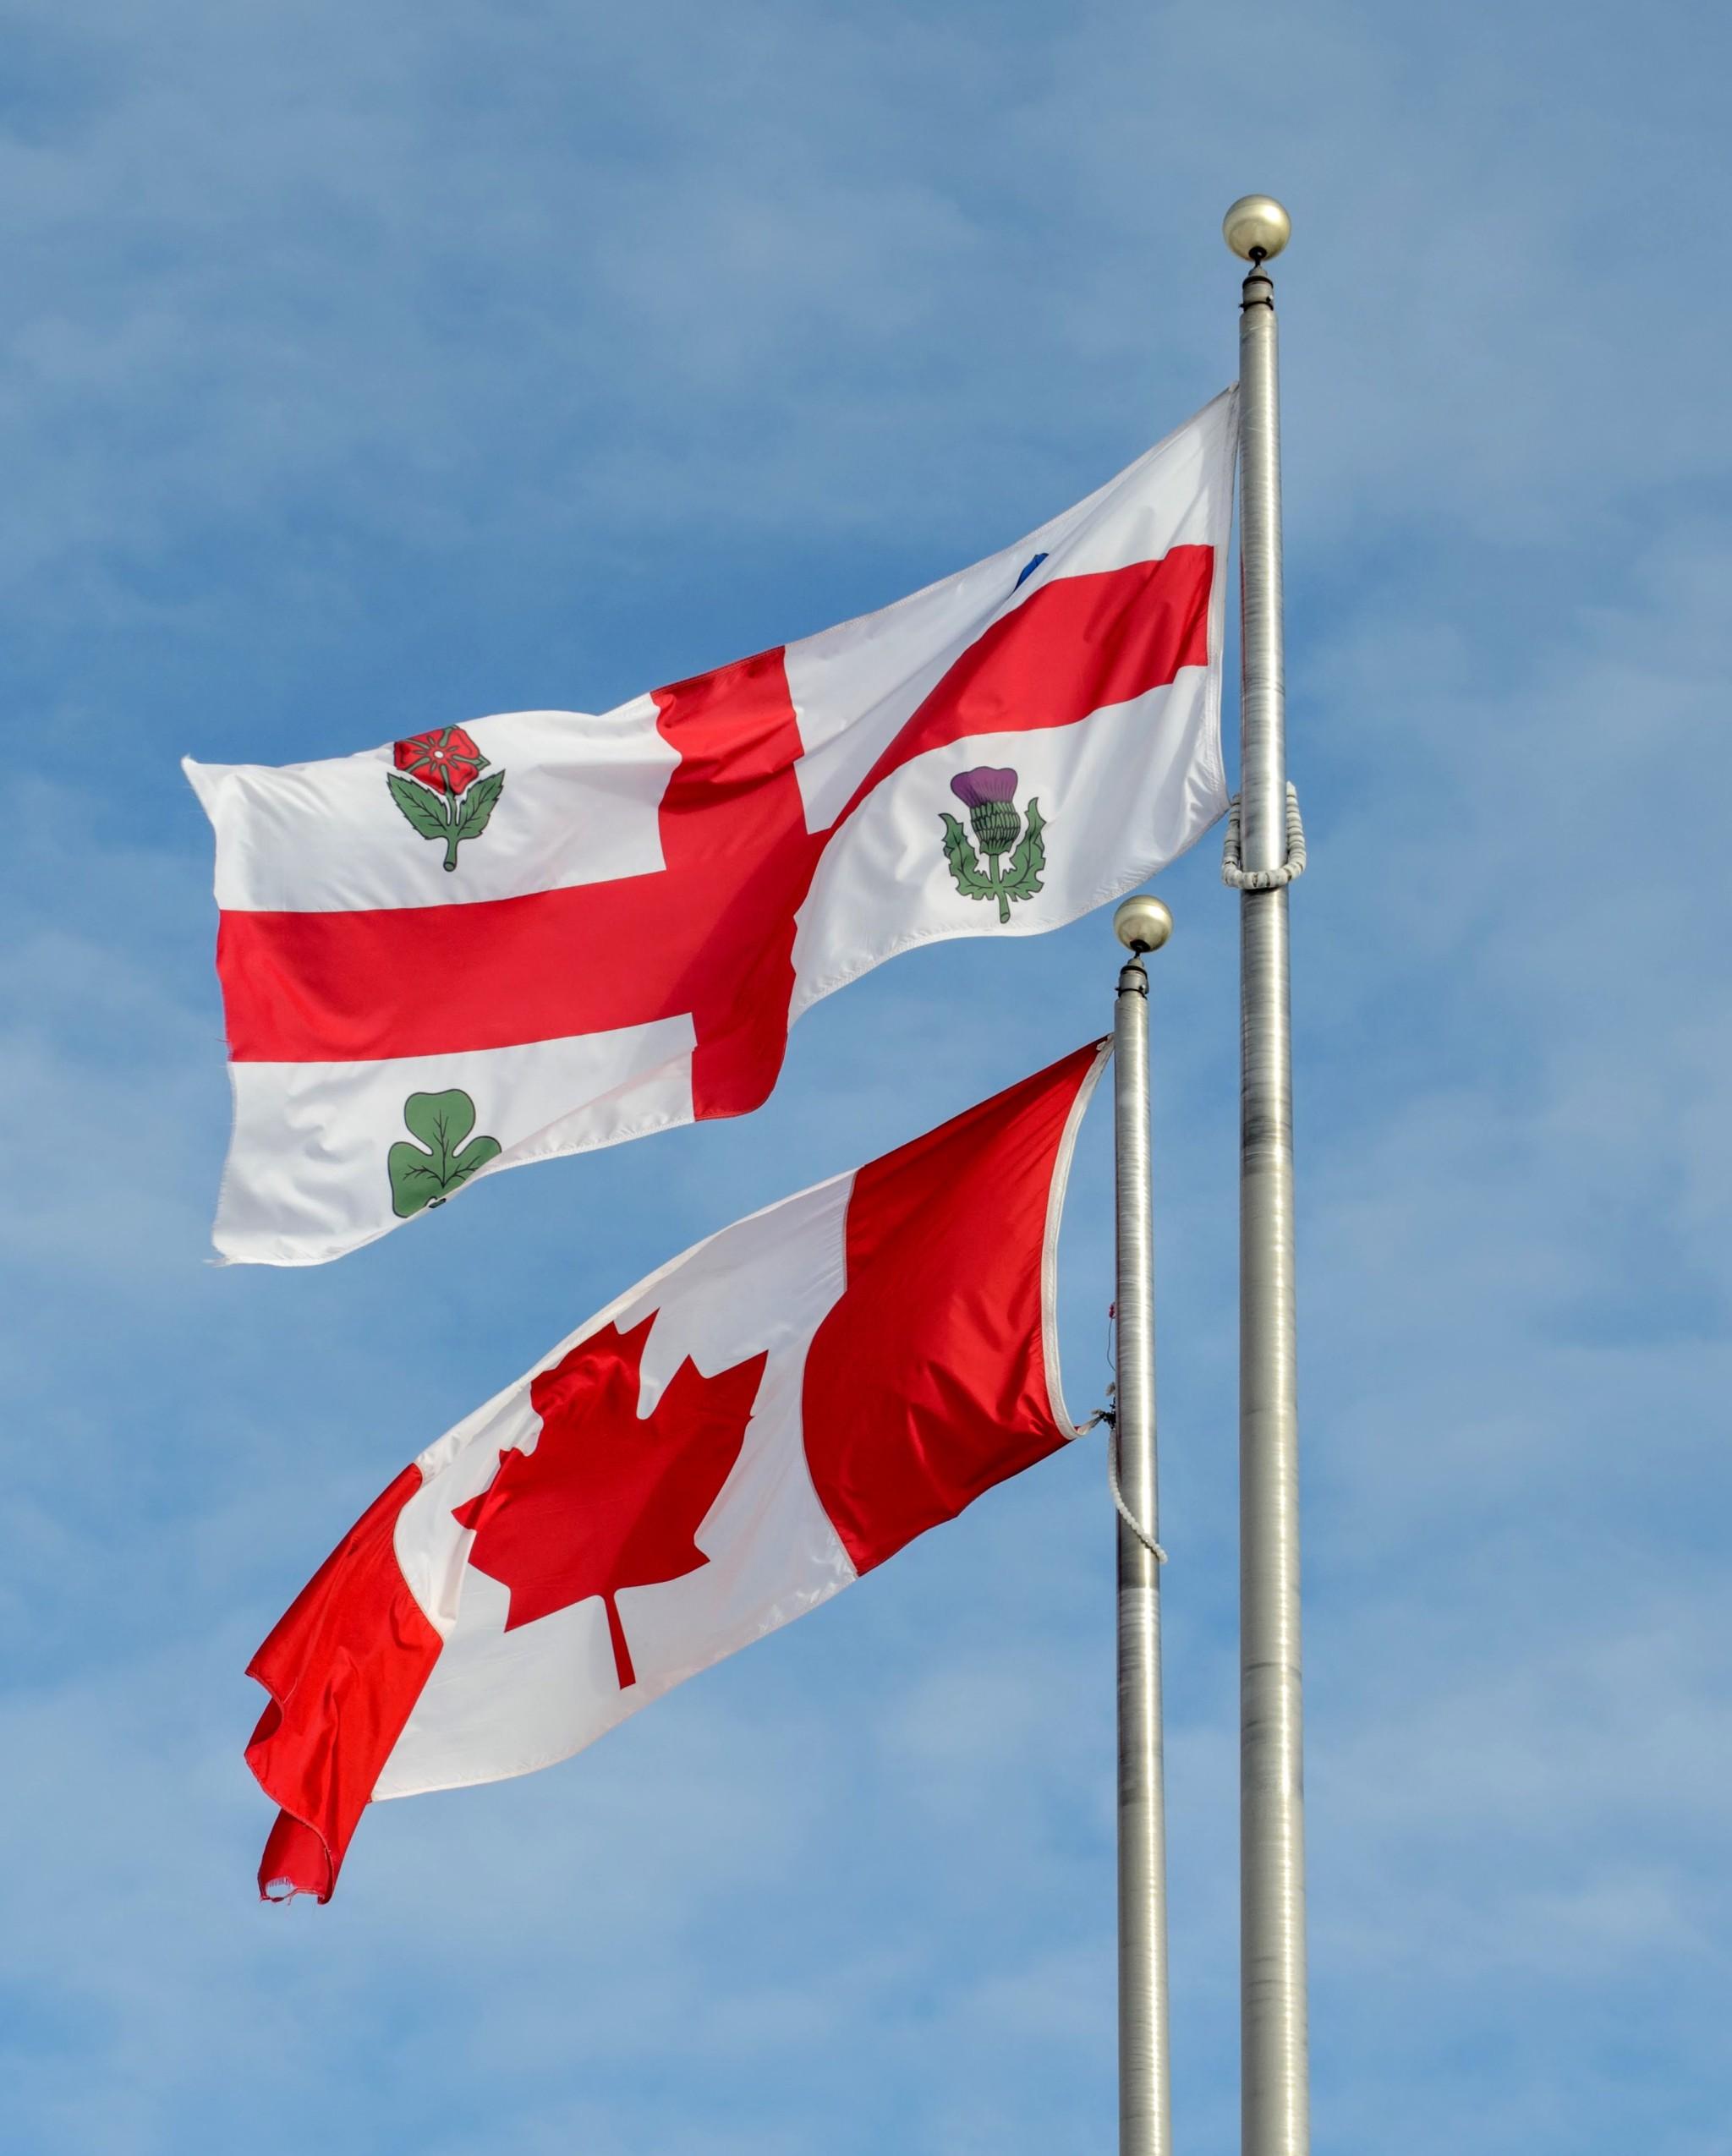 Bandiere Canadese e del Quebec a Montreal, Canada